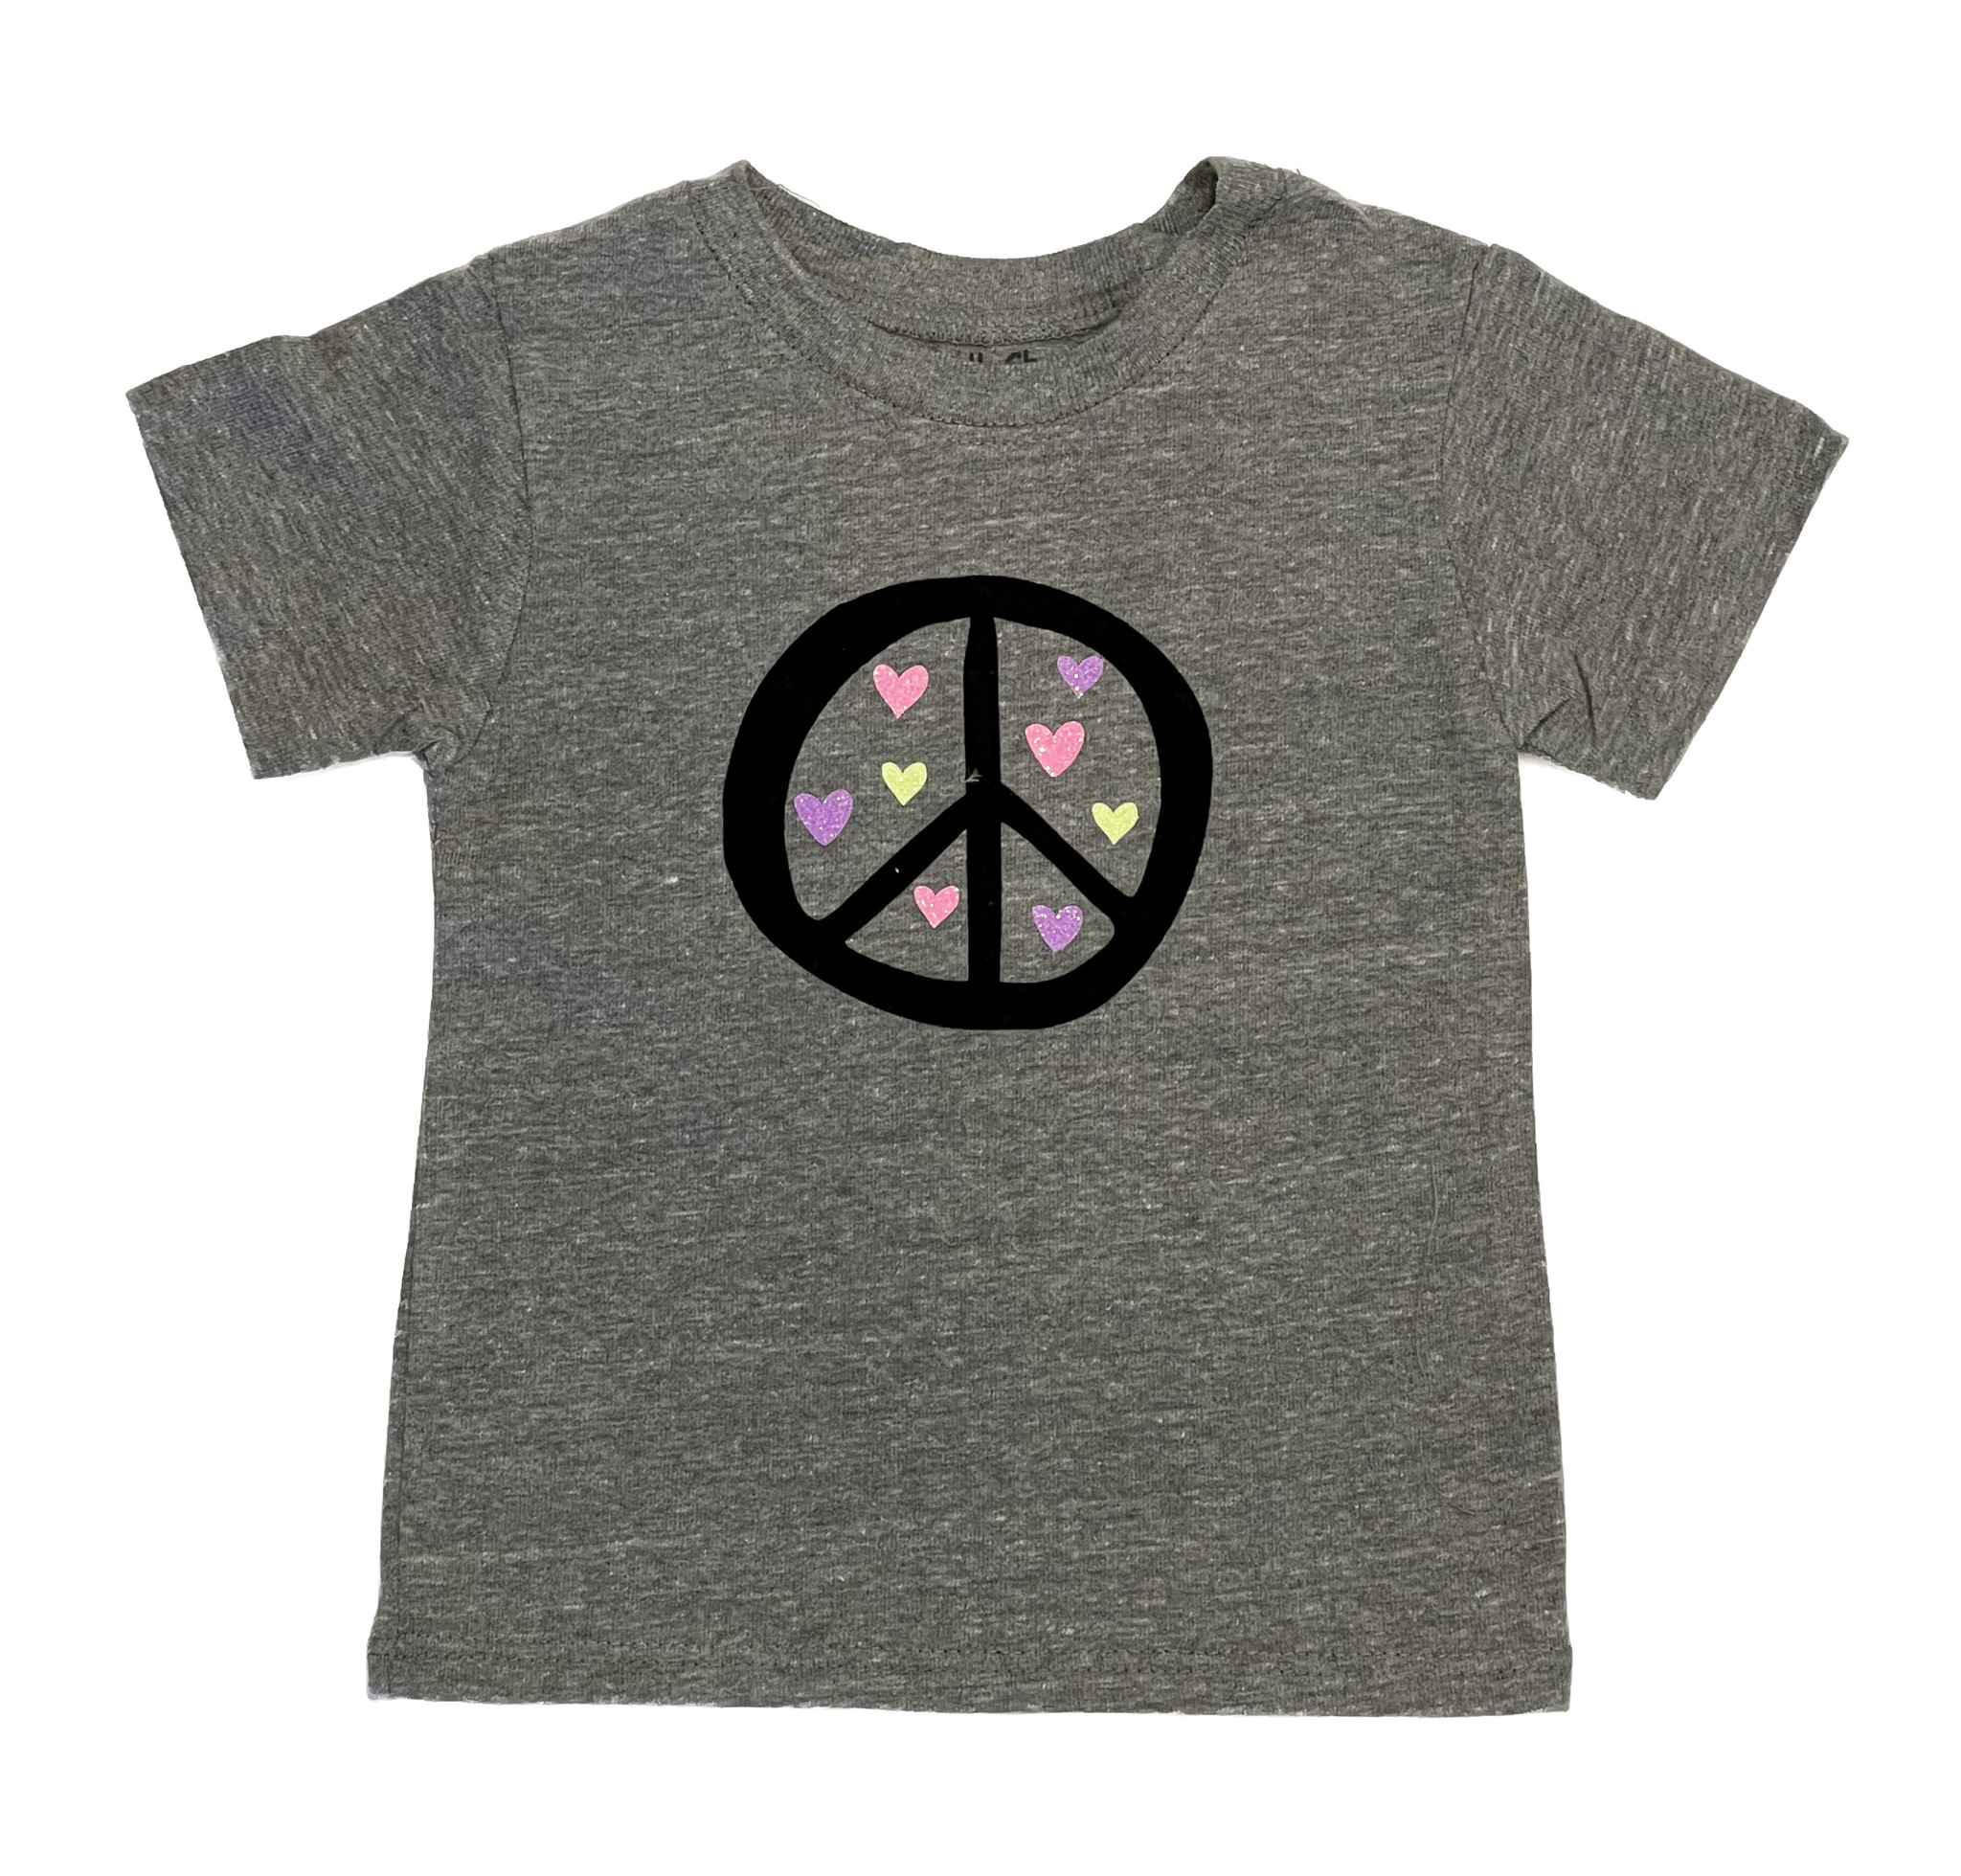 Small Change Grey Peace Hearts Tee